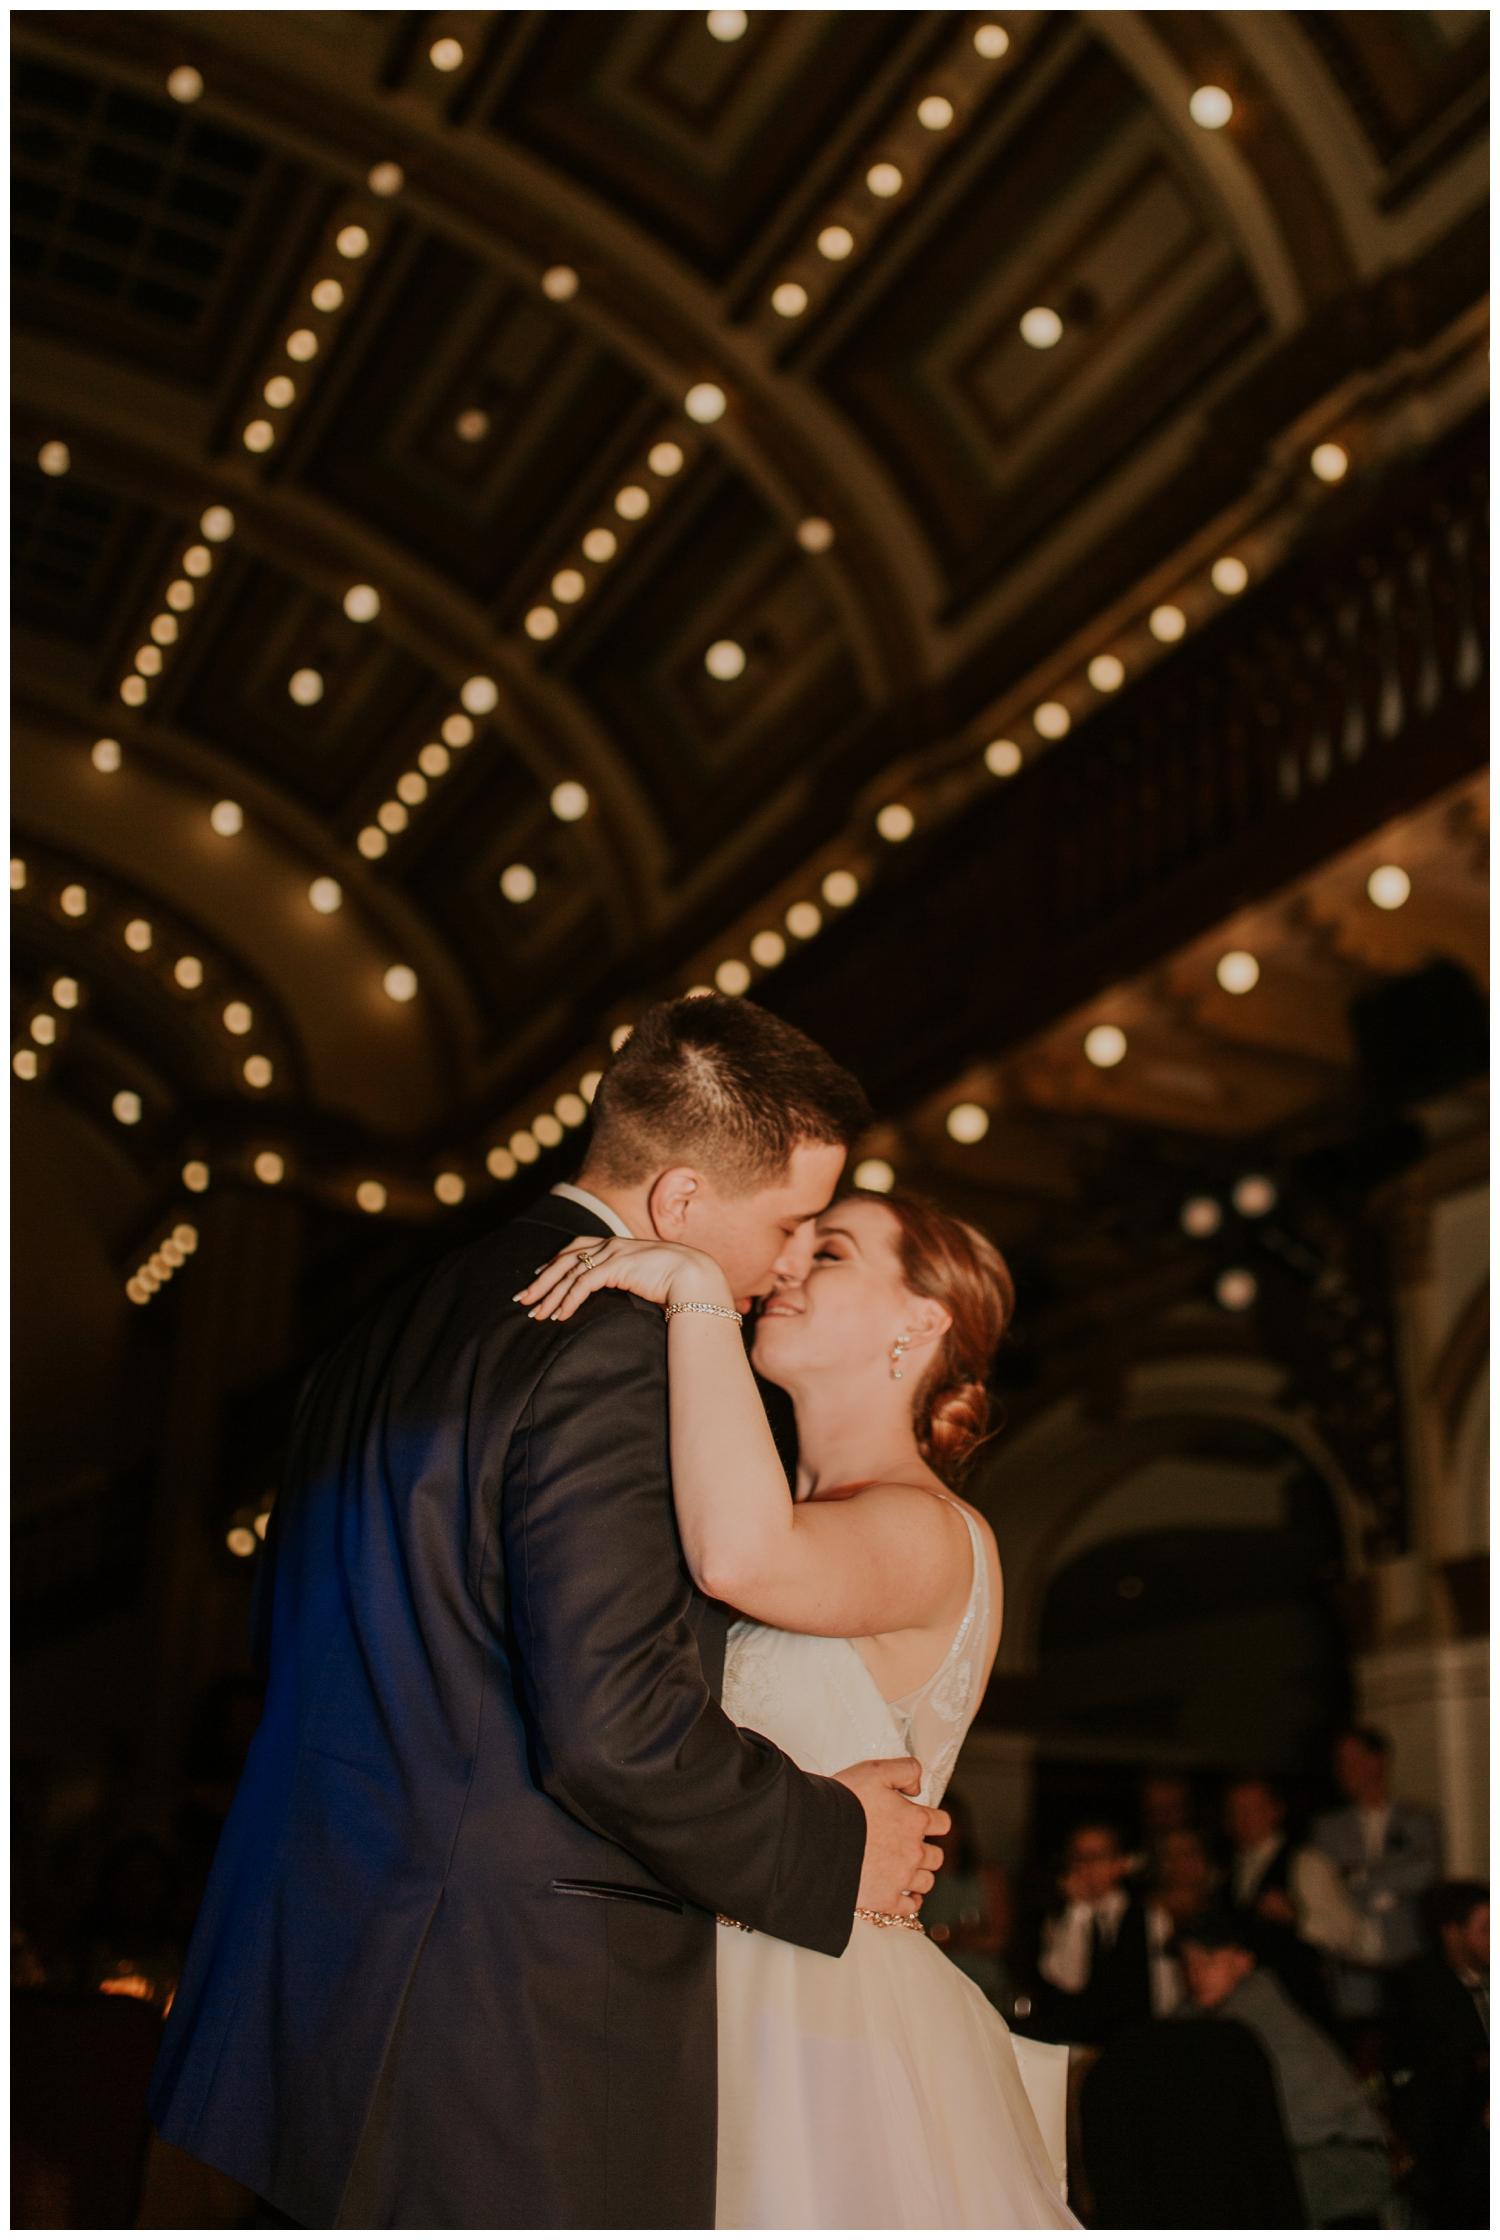 Jenna+Brandon, Mission Concepcion Wedding, San Antonio, Contista Productions Wedding Photography_0100.jpg